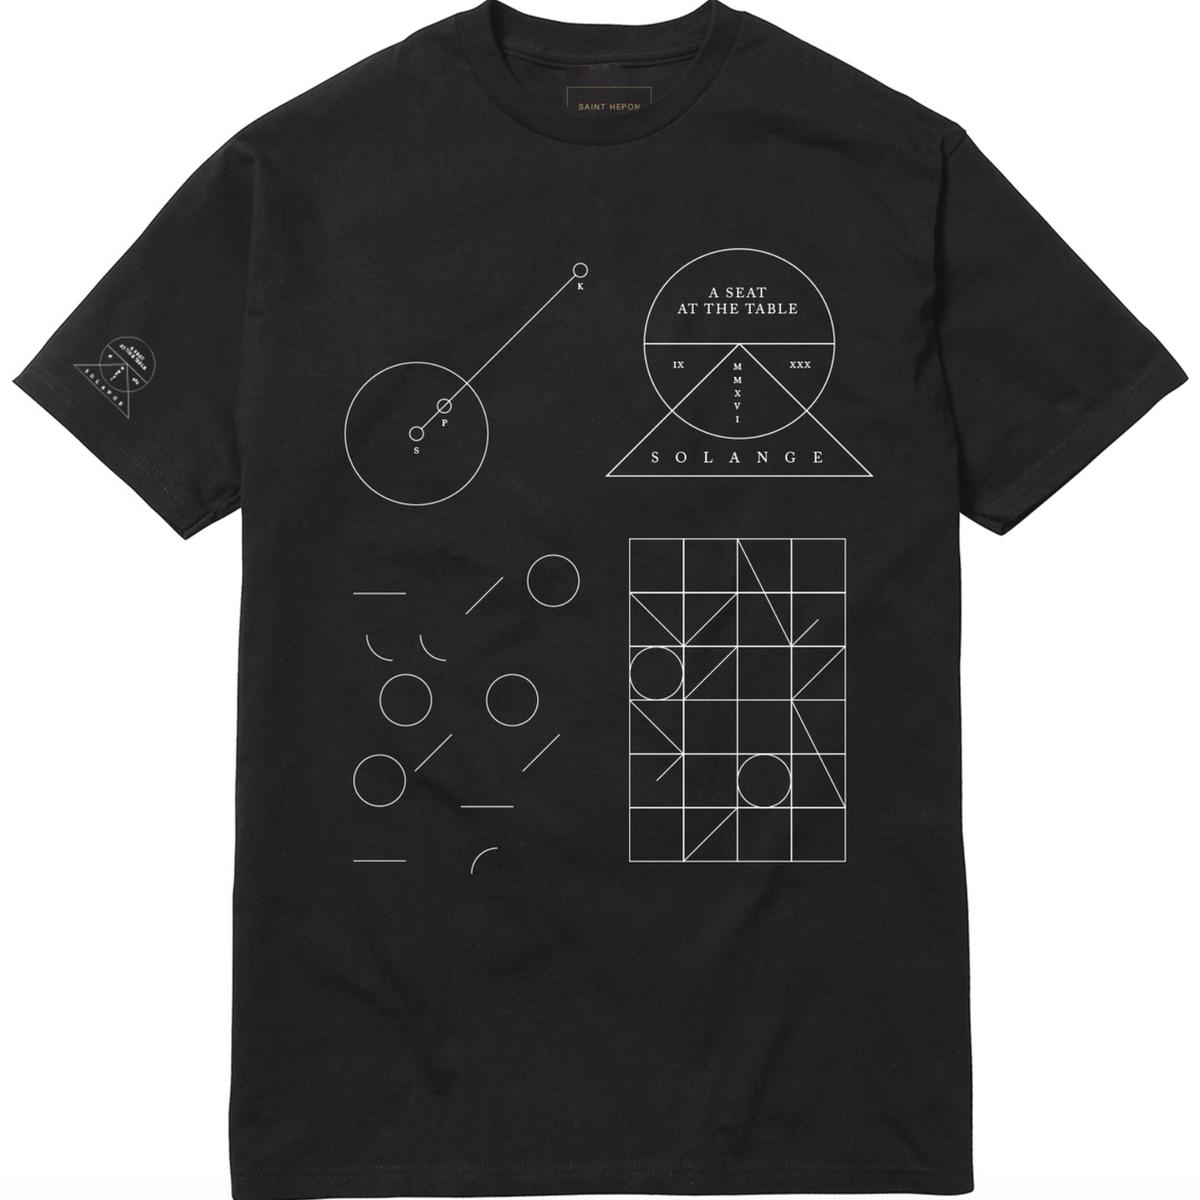 Orion's Rise Short Sleeve Tee - Black